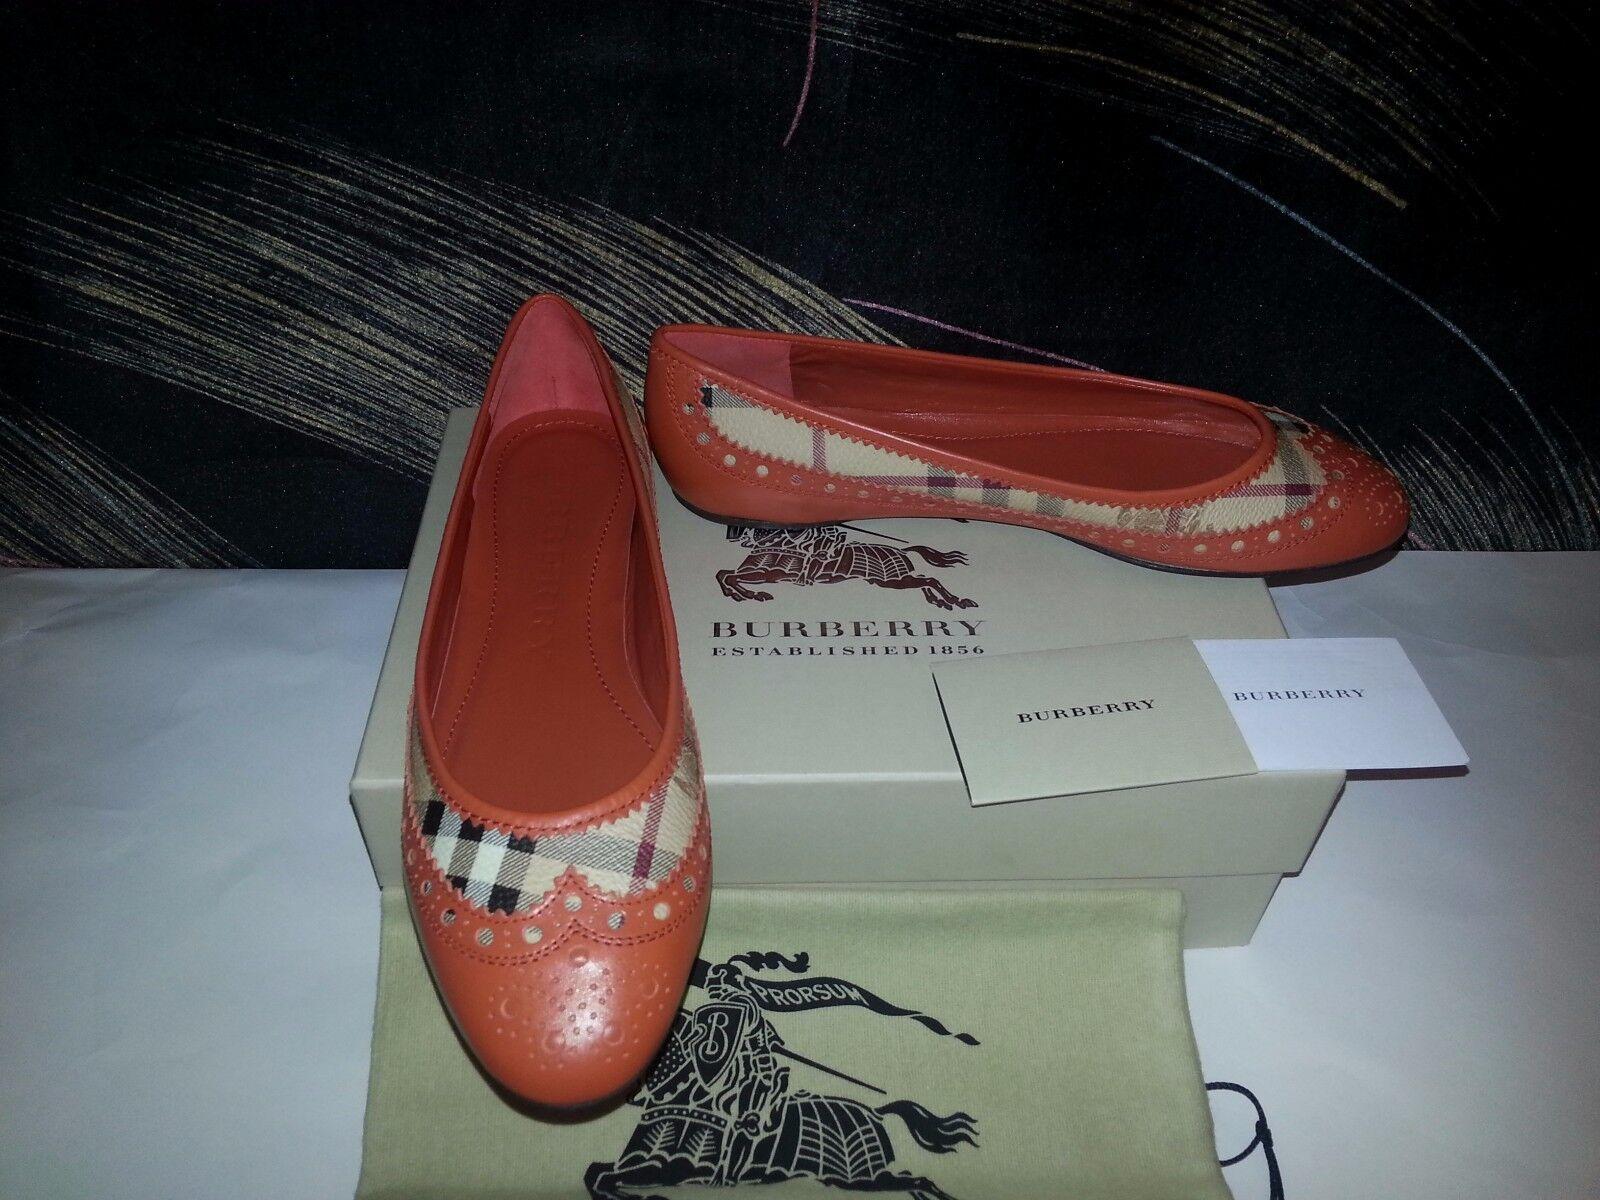 NIB Burberry London Classic Signature Check Plaids Leather Flats 39 8.5 New